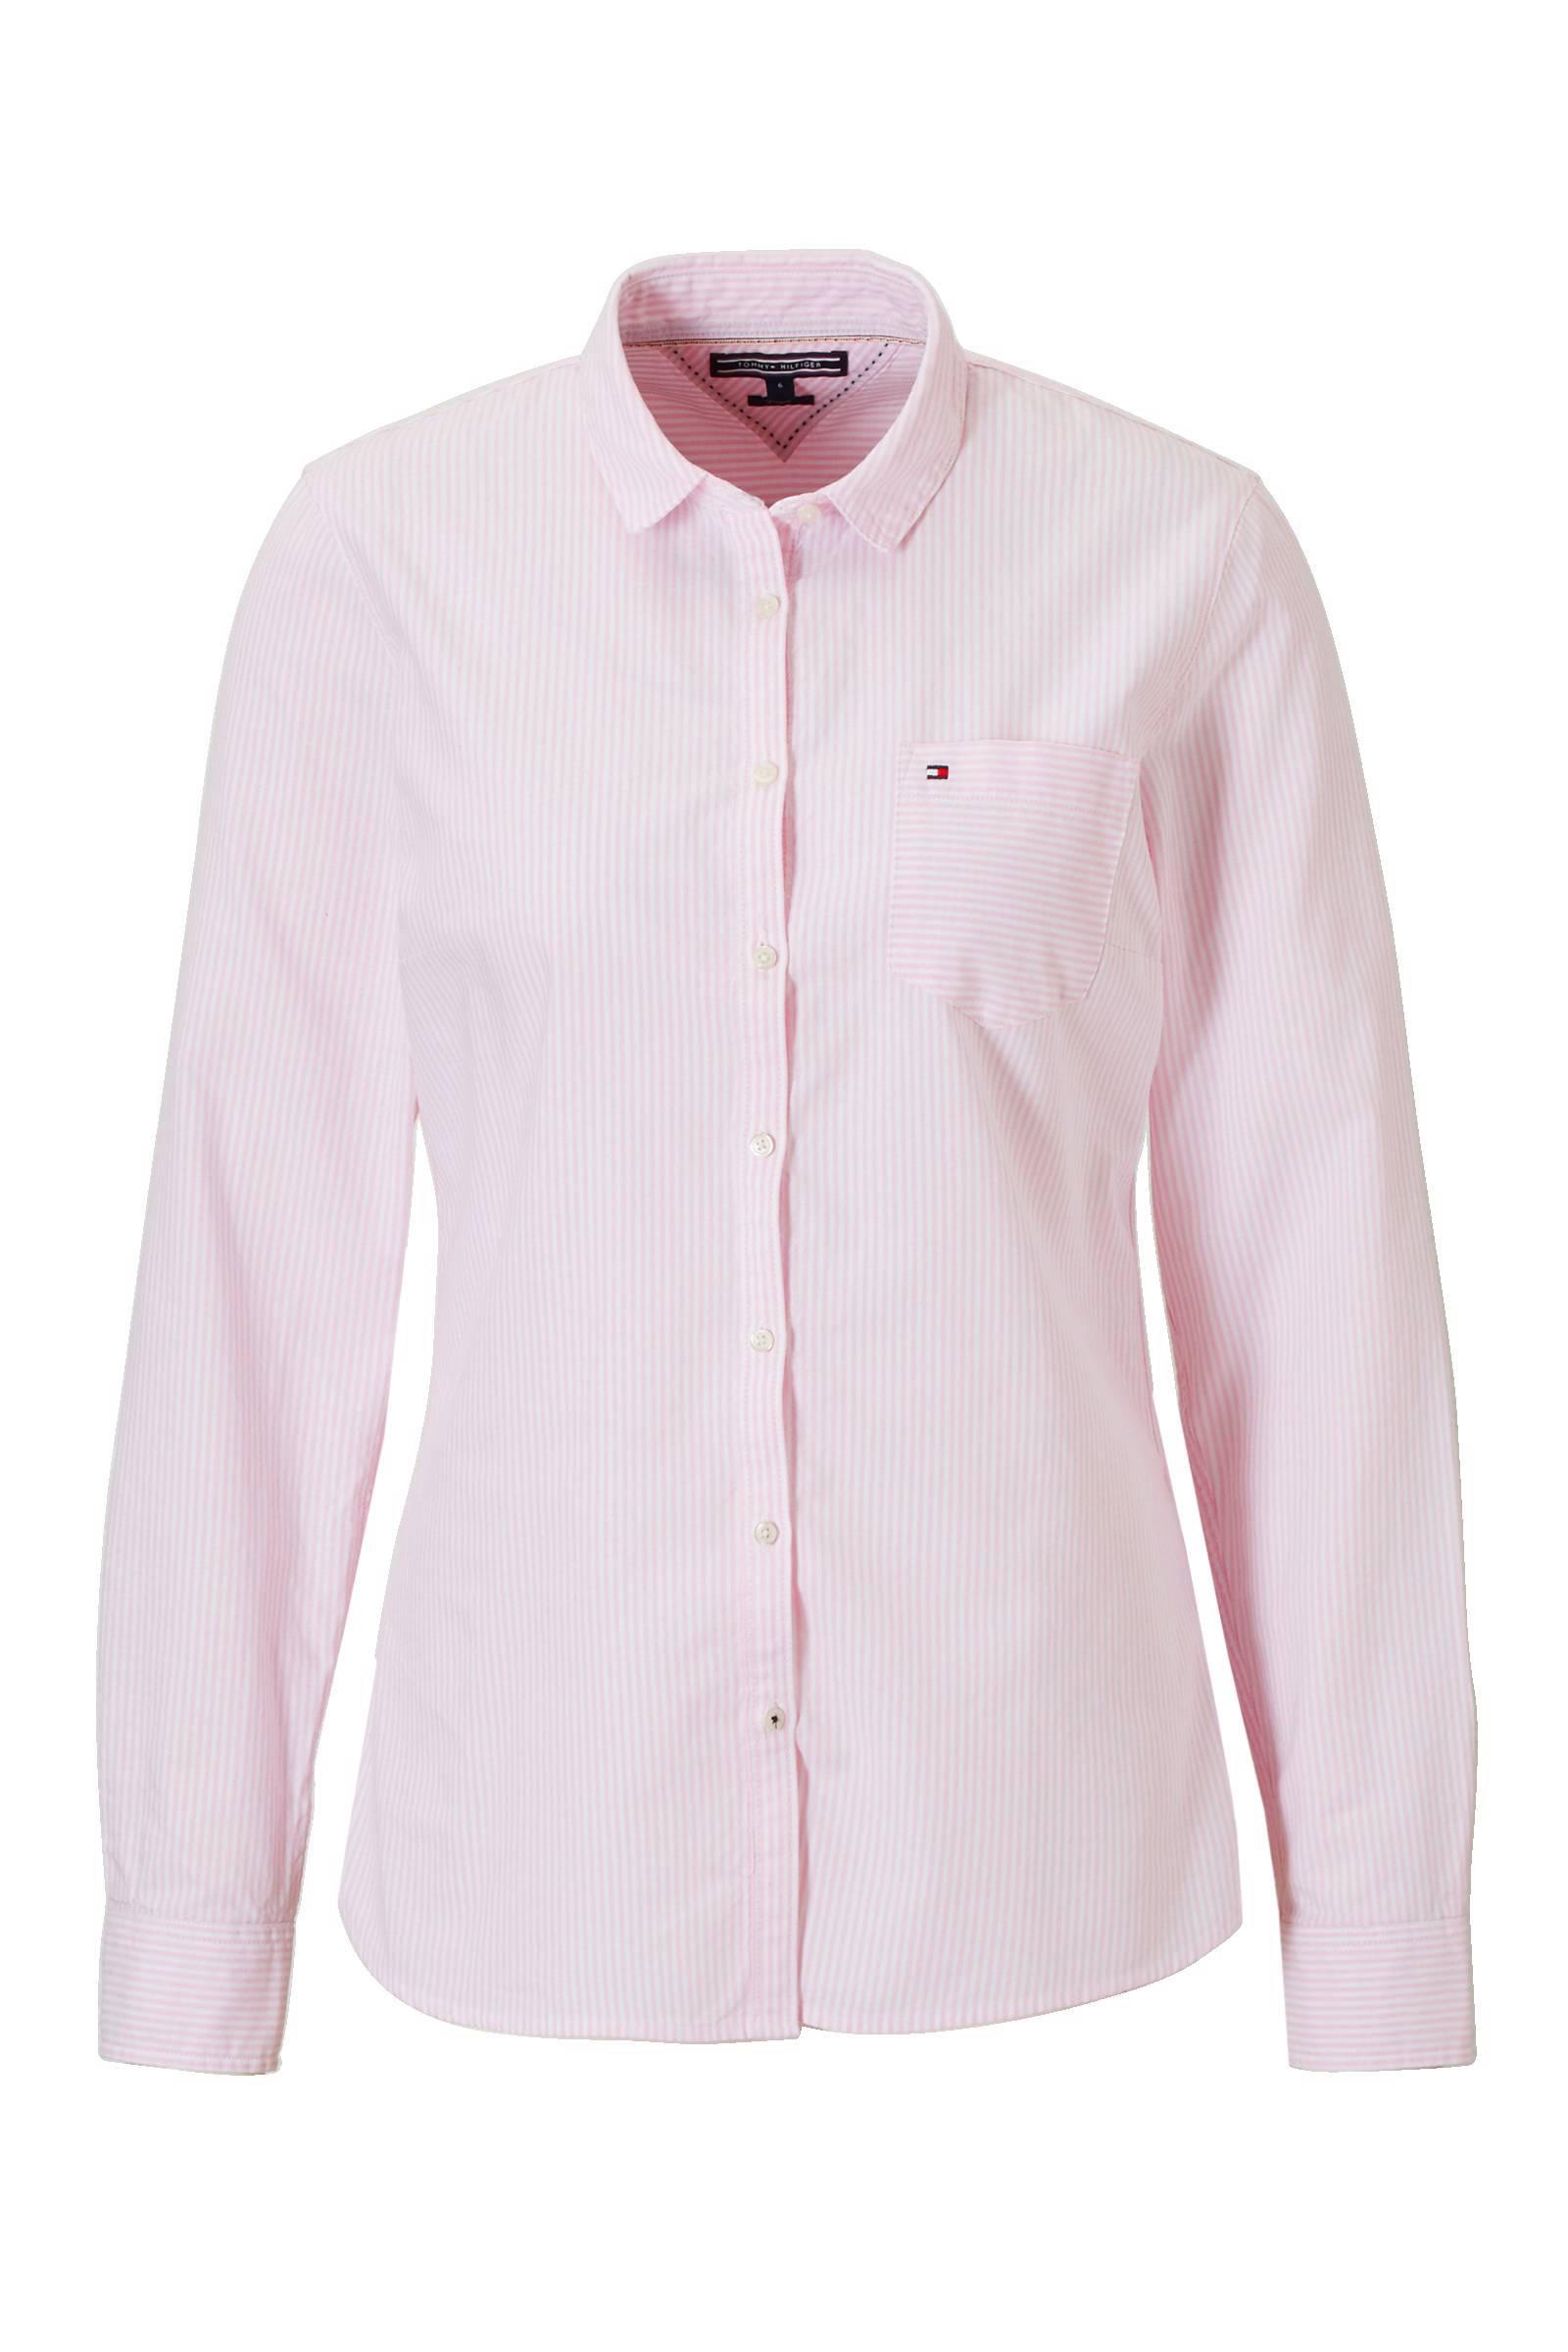 roze overhemd dames